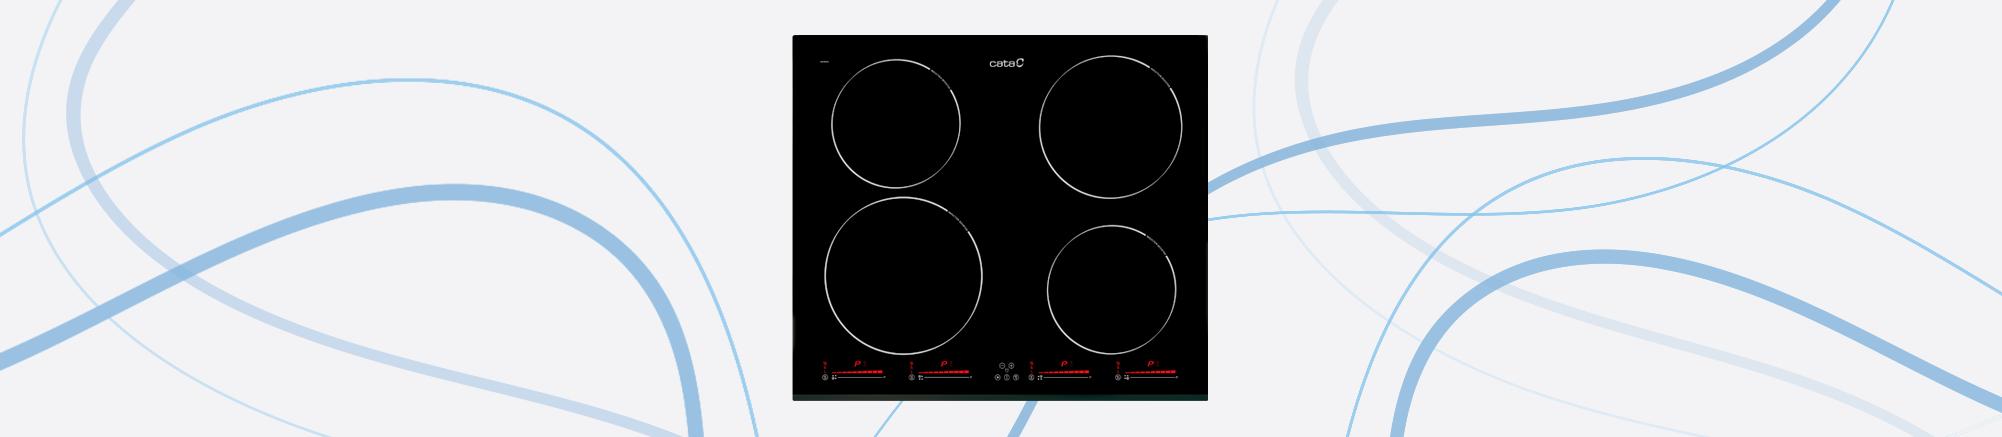 Placas - Placas de Inducción | CATA electrodomésticos